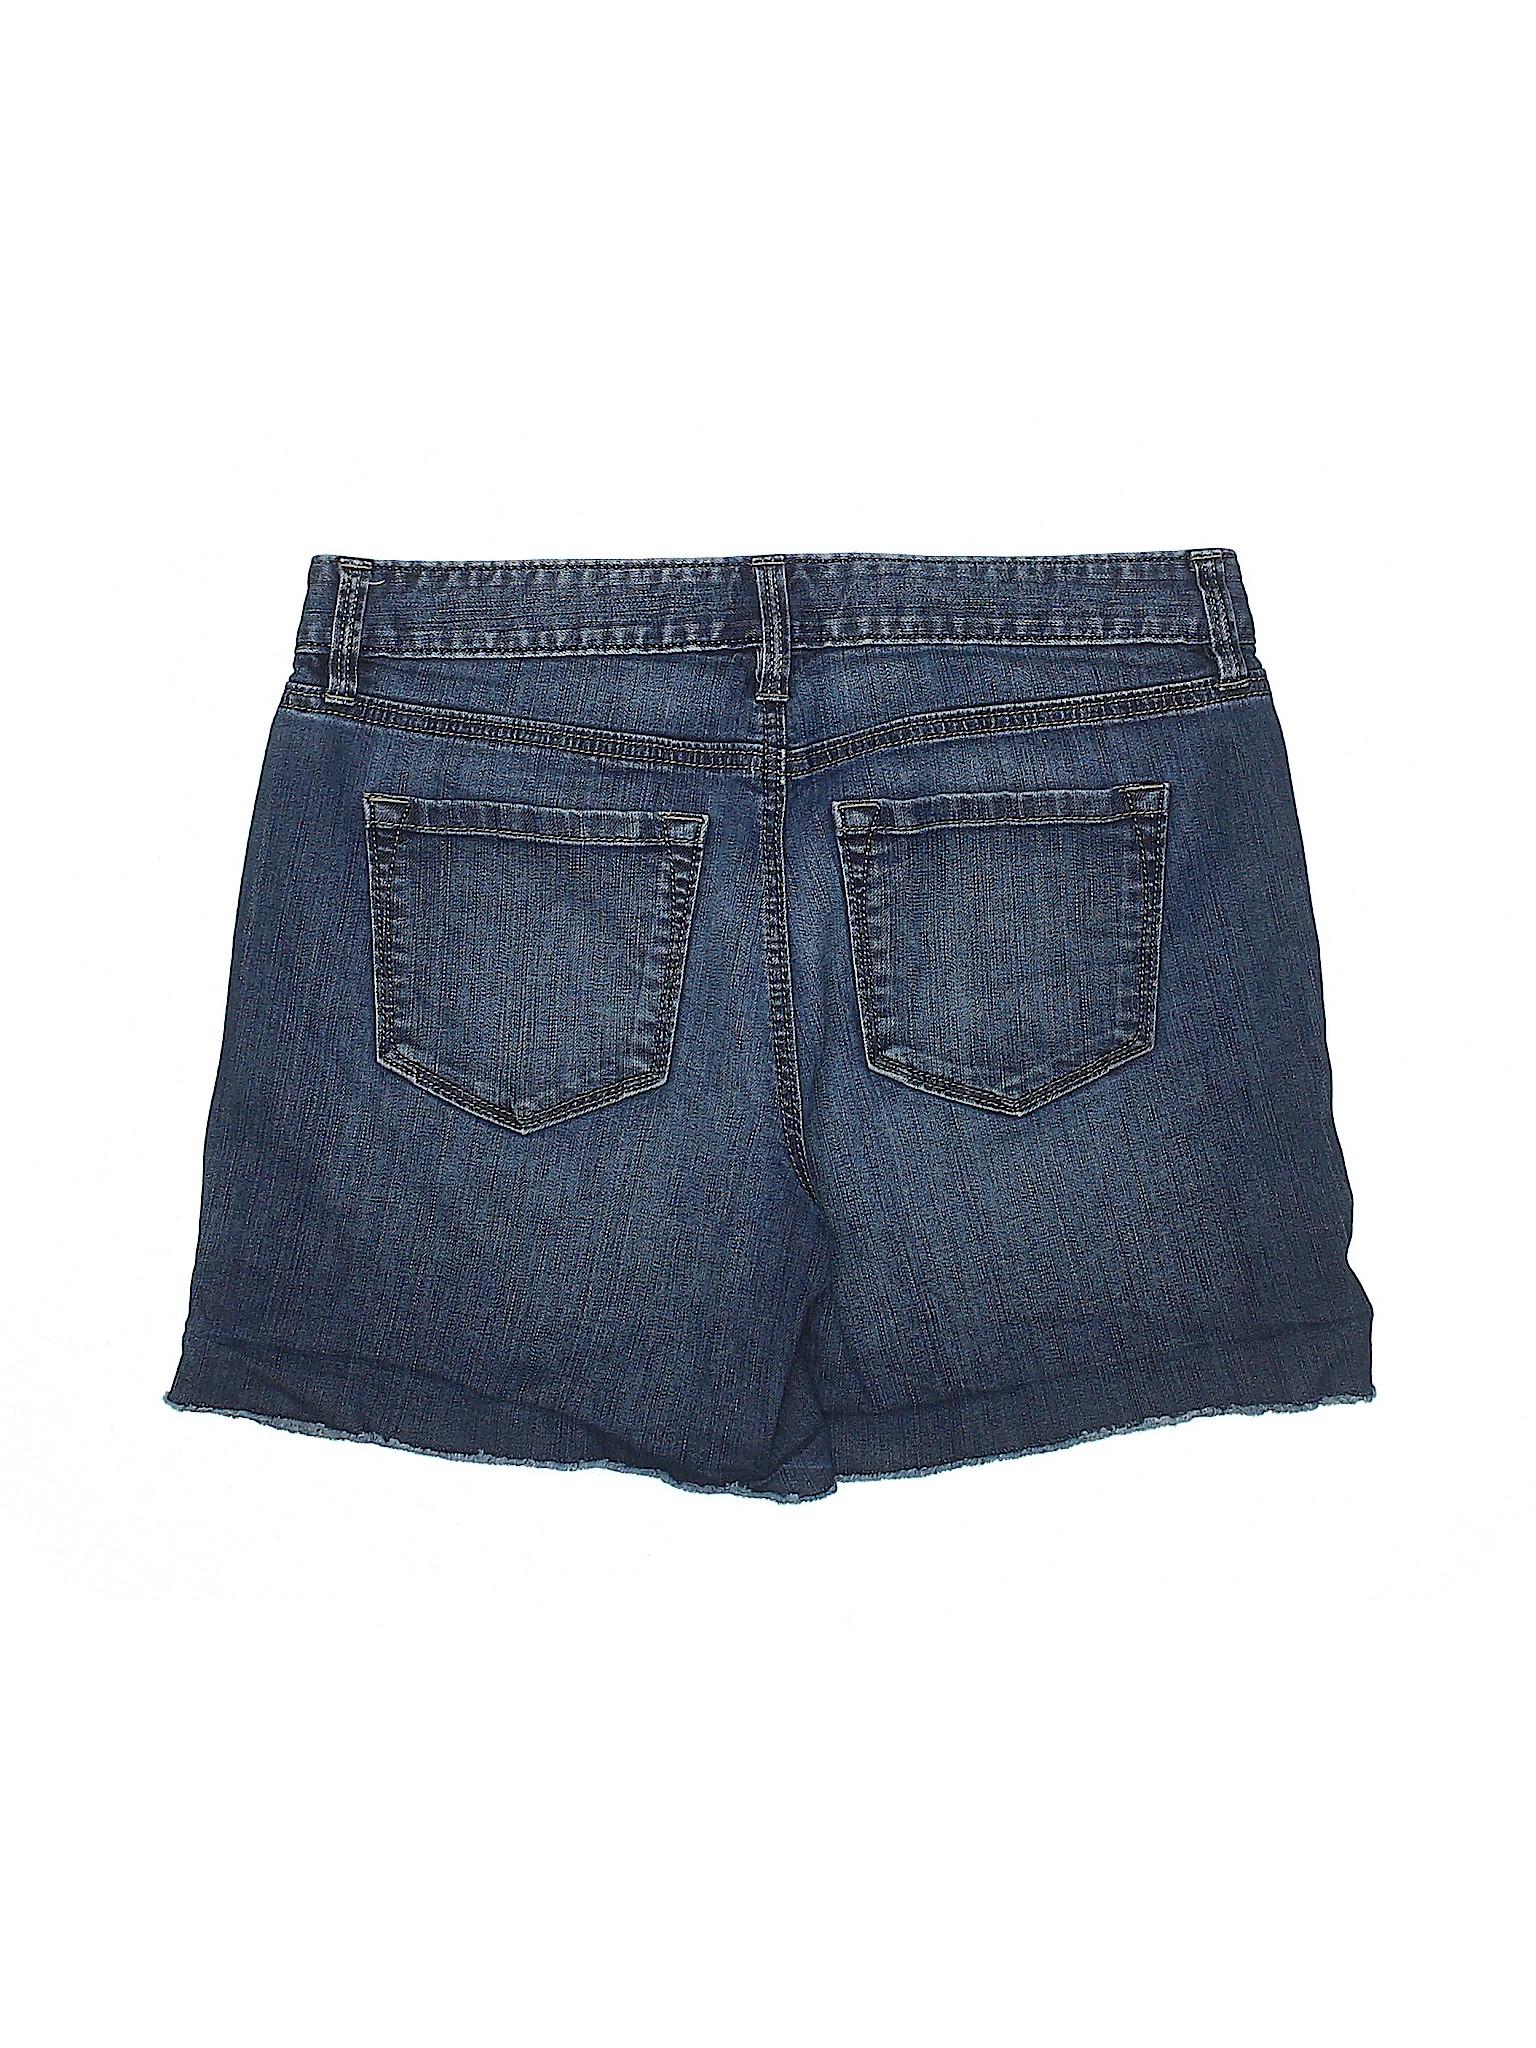 Denim Boutique LOFT leisure Taylor Shorts Ann 0wqa4I1